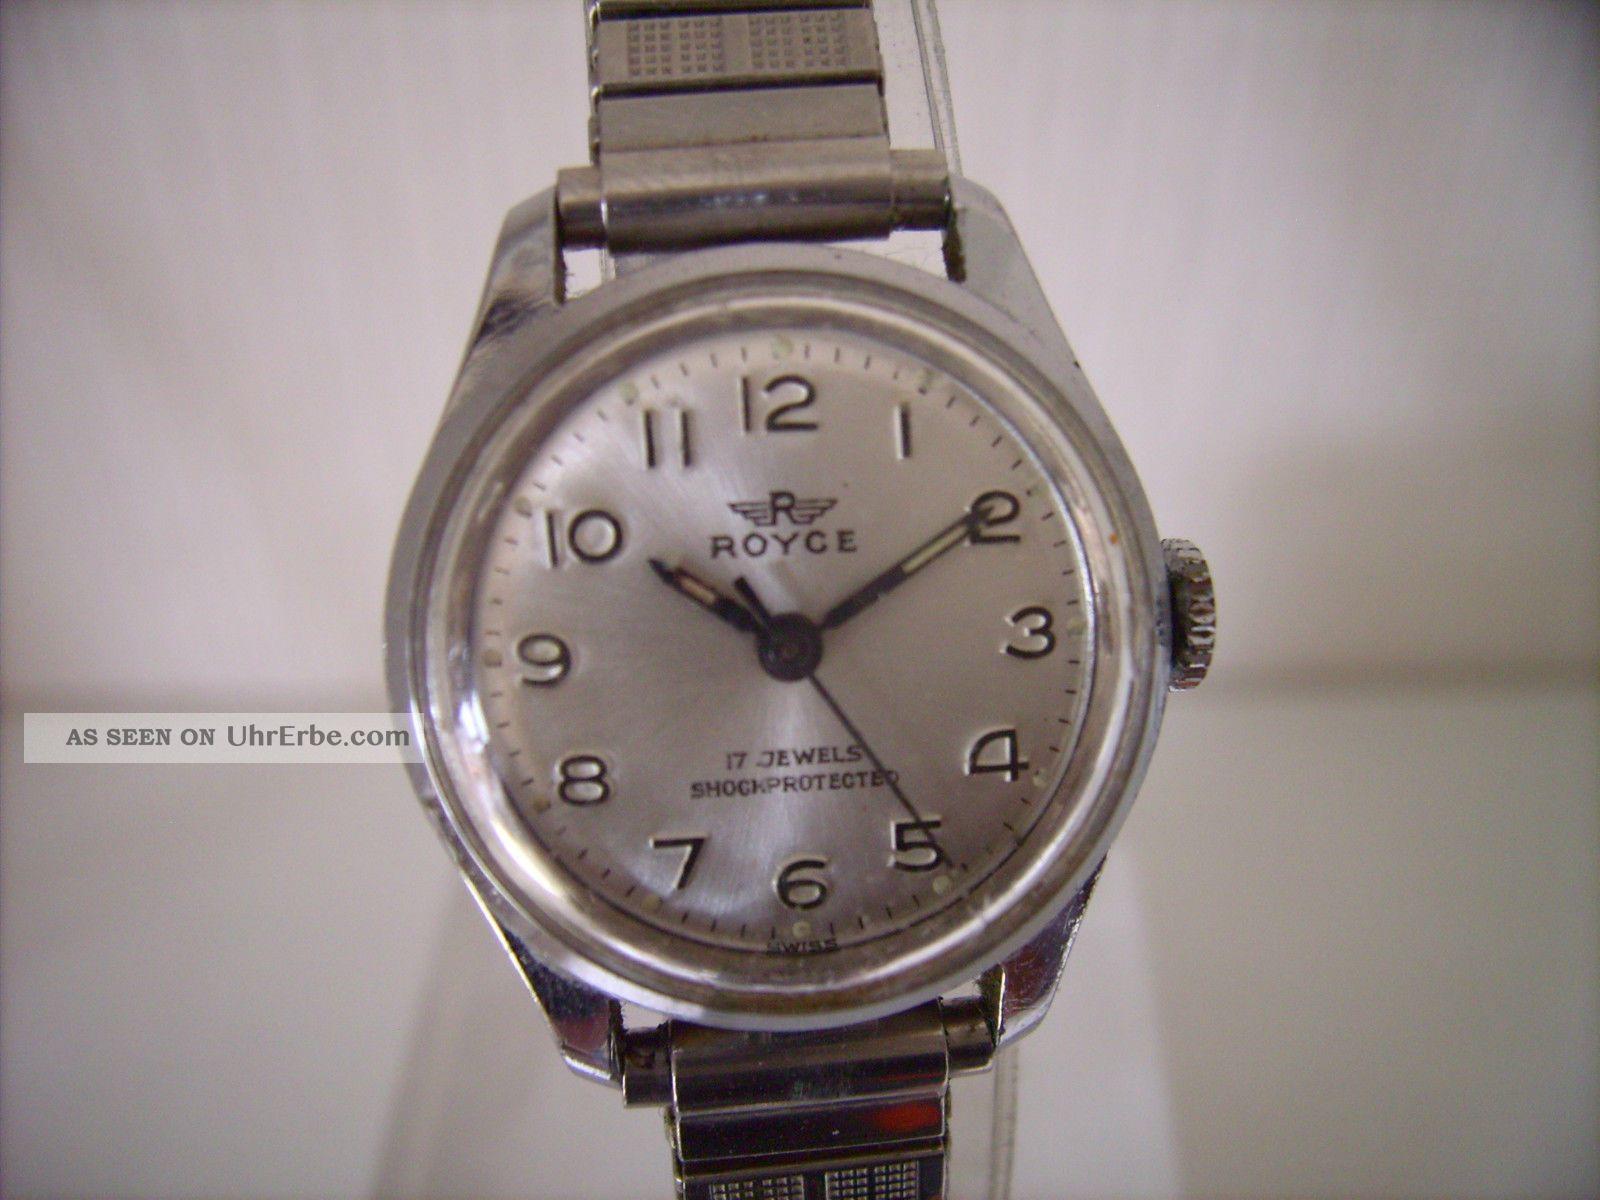 Royce Damen Armbanduhr 80er Jahre Kal.  Fef 6680 Armbanduhren Bild